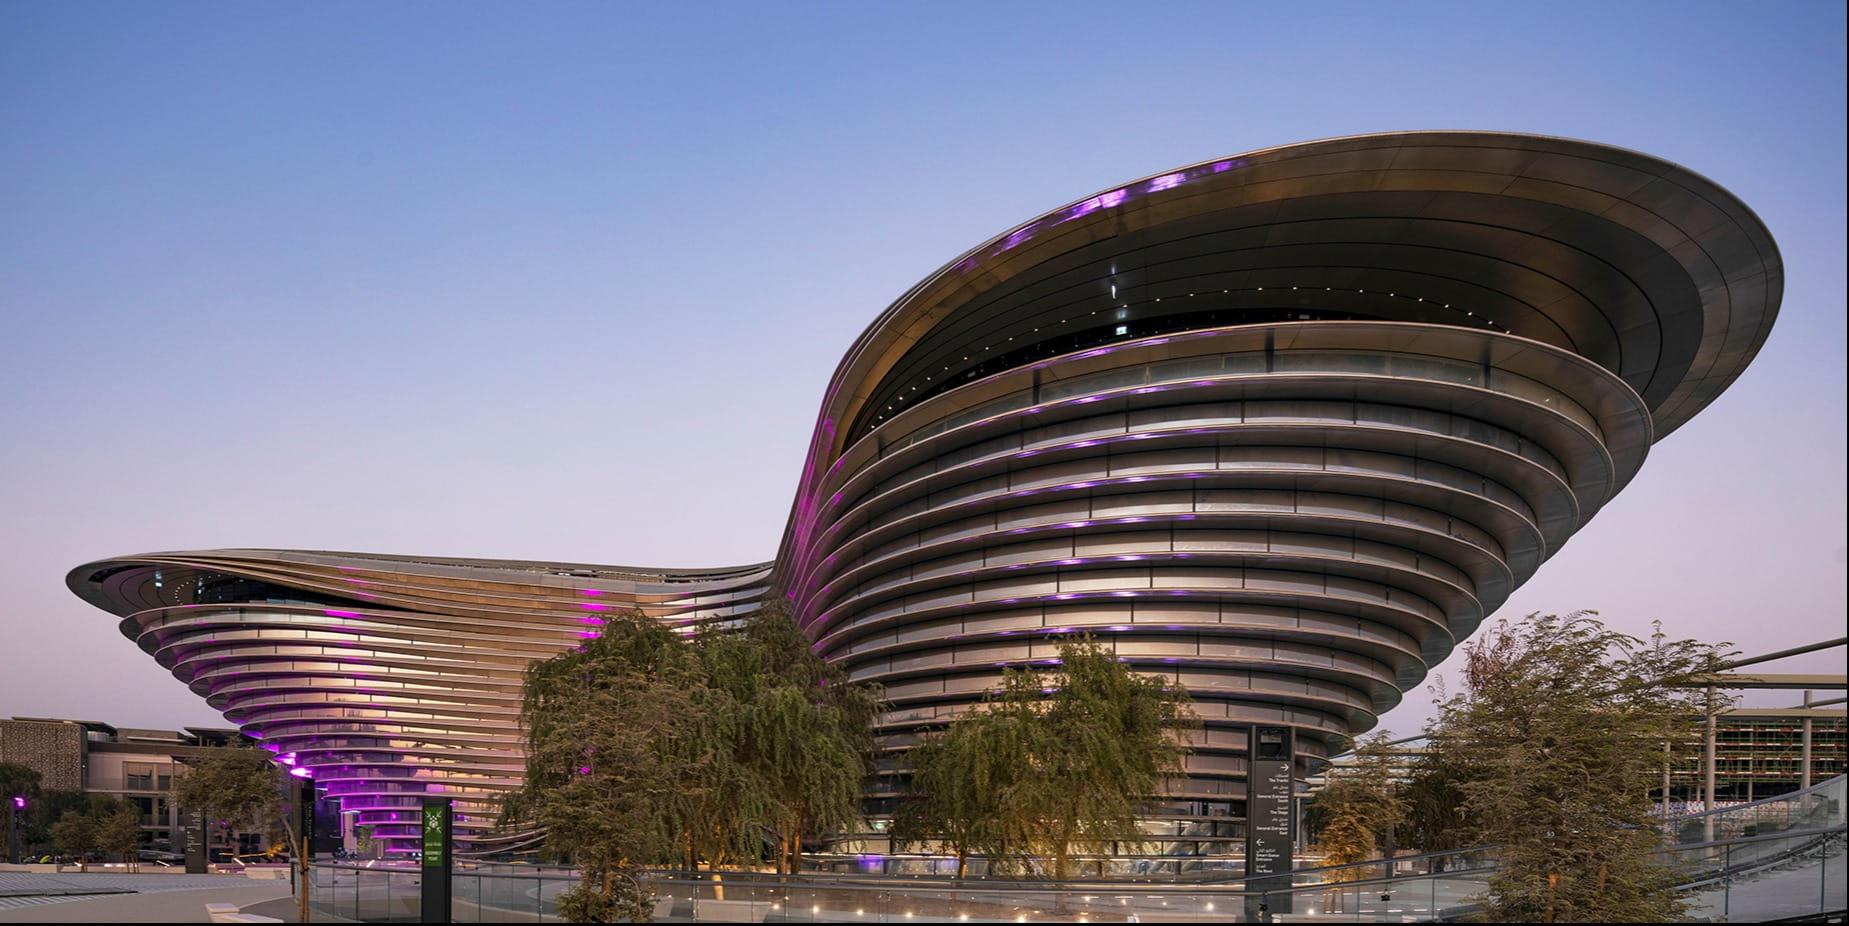 Foster + Partners-designed Mobility Pavilion for Expo 2020 Dubai evokes a sense of movement